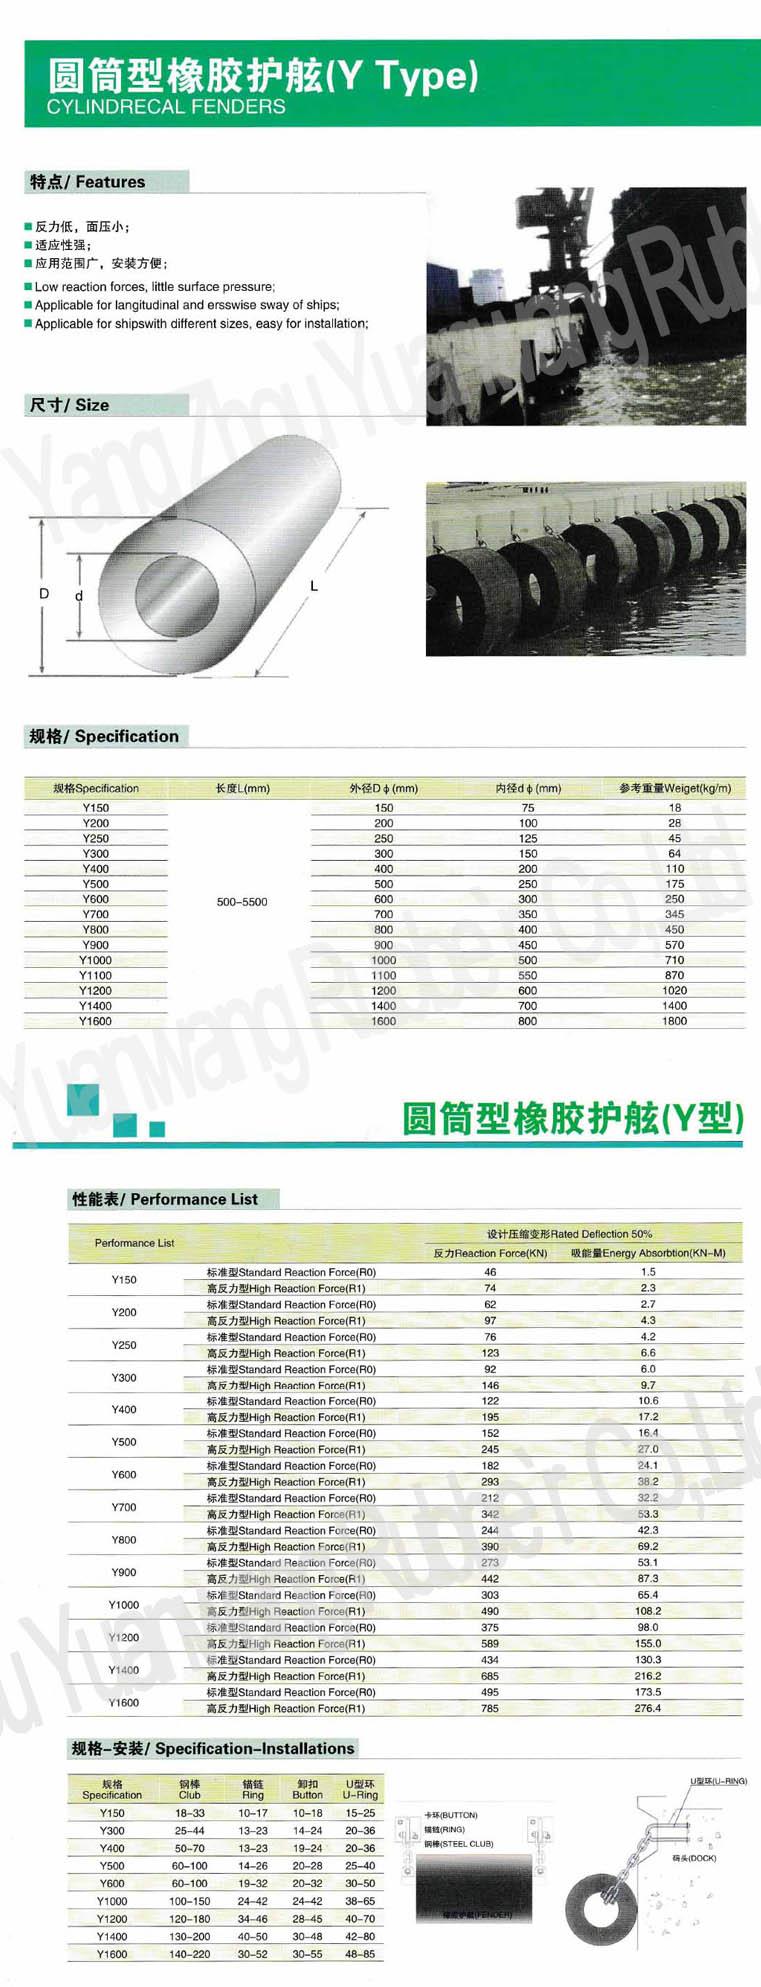 Cylinderical Marine Fender (Y Type)